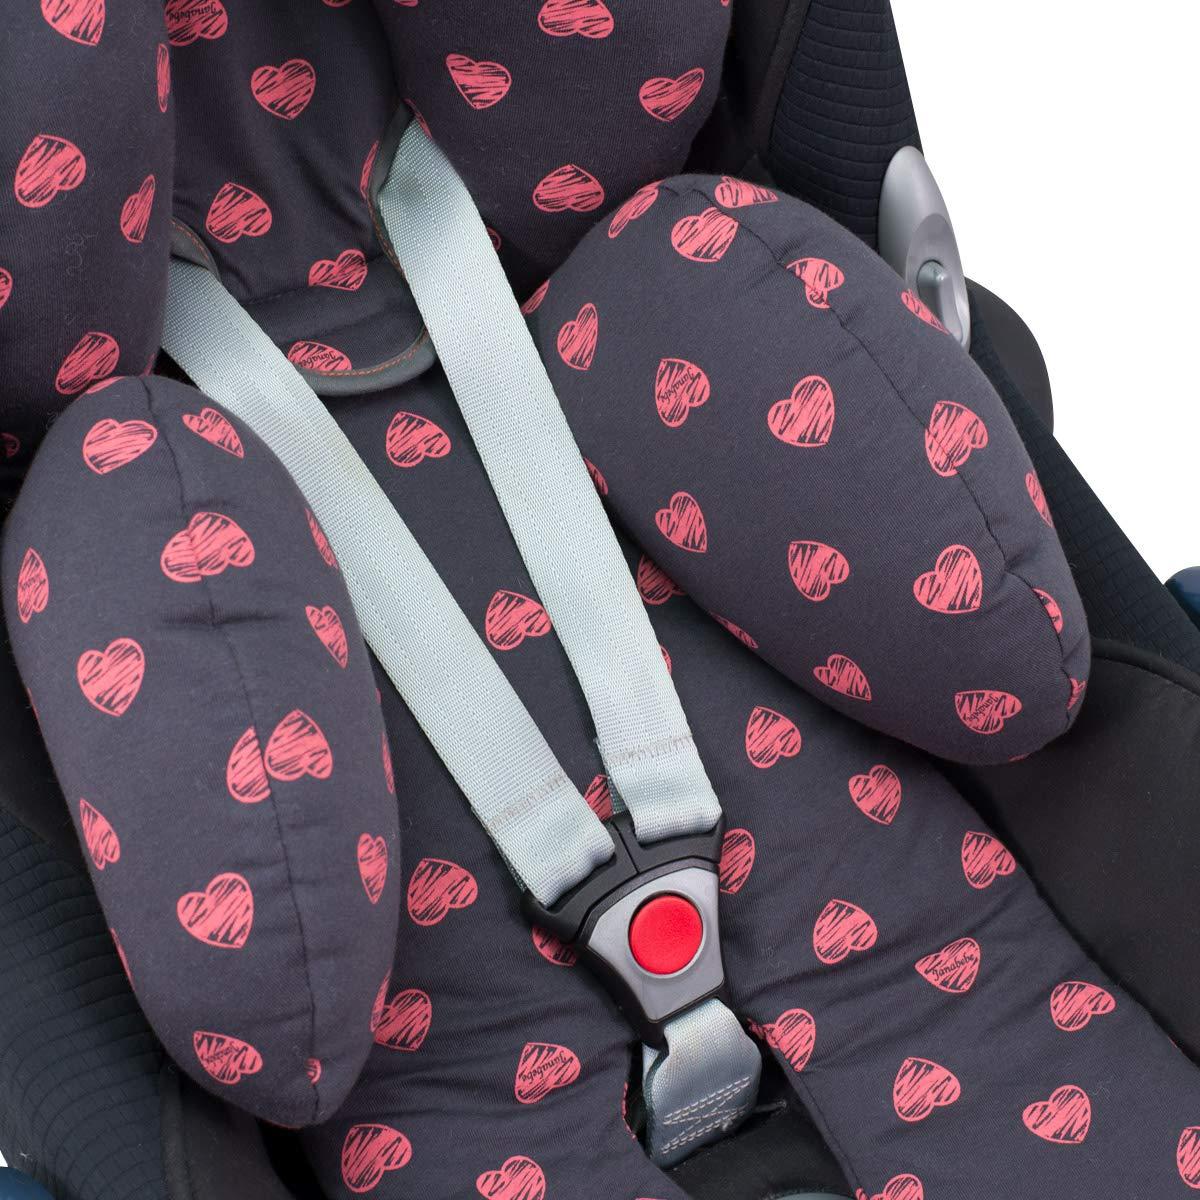 Reducer Cushion Infant Head /& Baby Body Support Antiallergic Janabebe Stone Grey